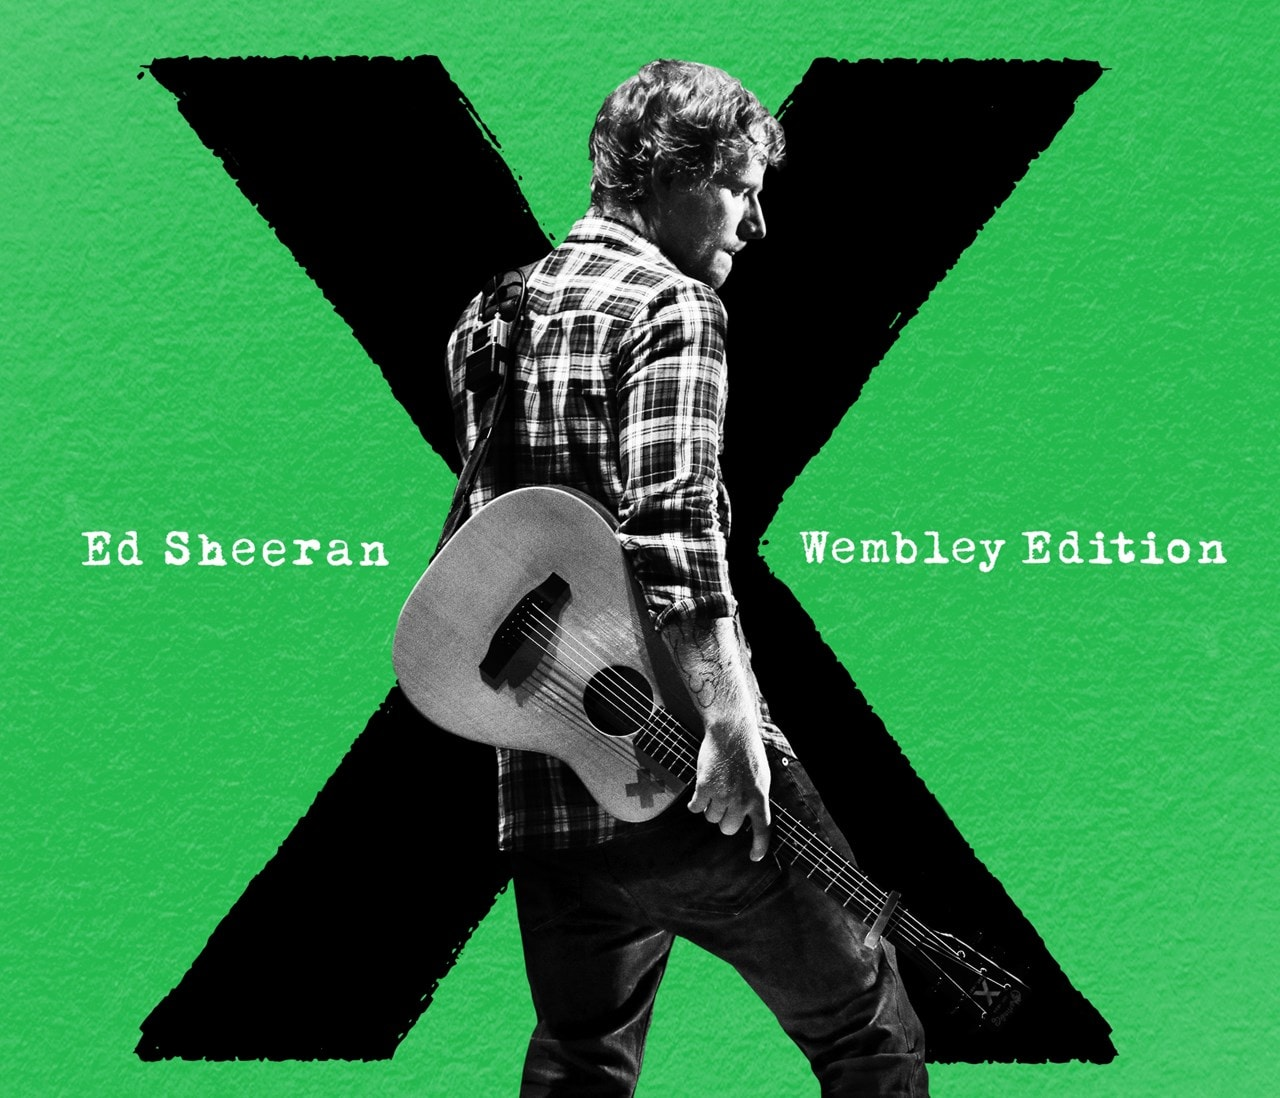 X: Wembley Edition - 1